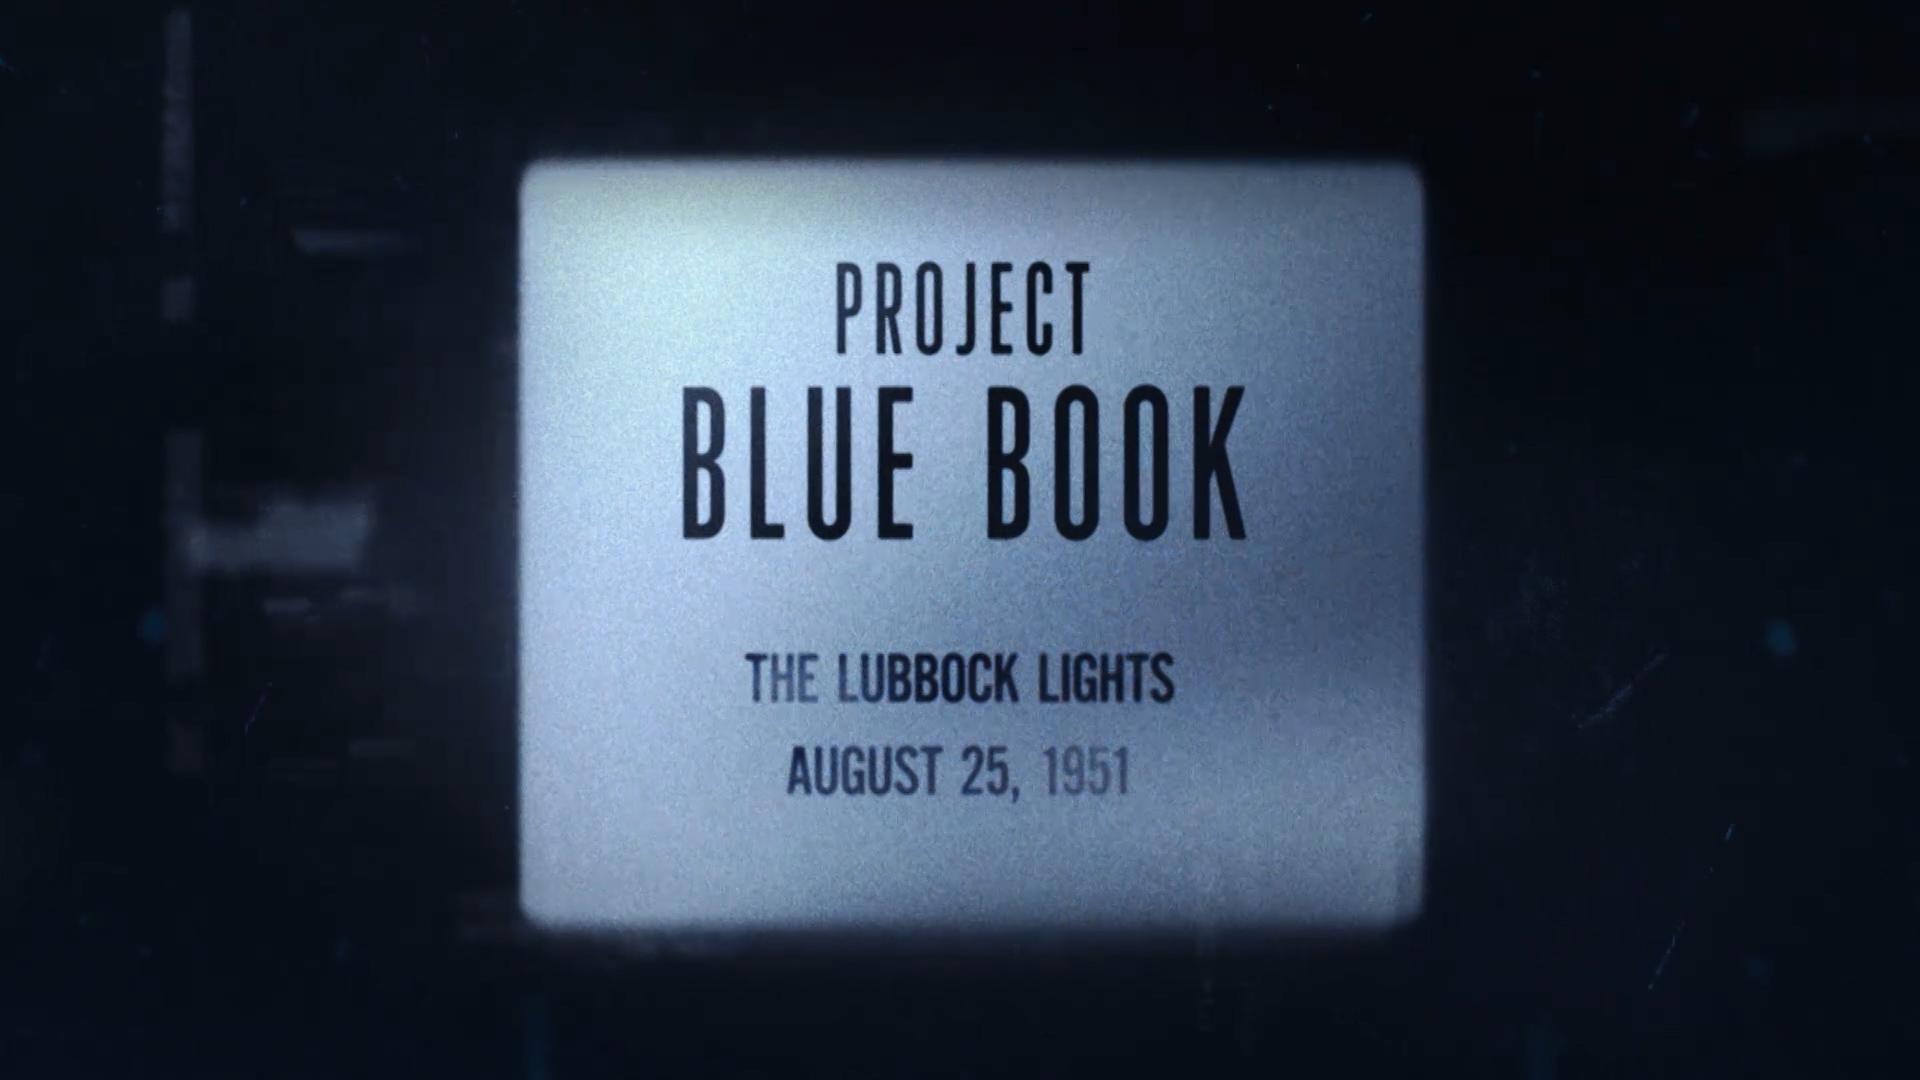 The Lubbock Lights